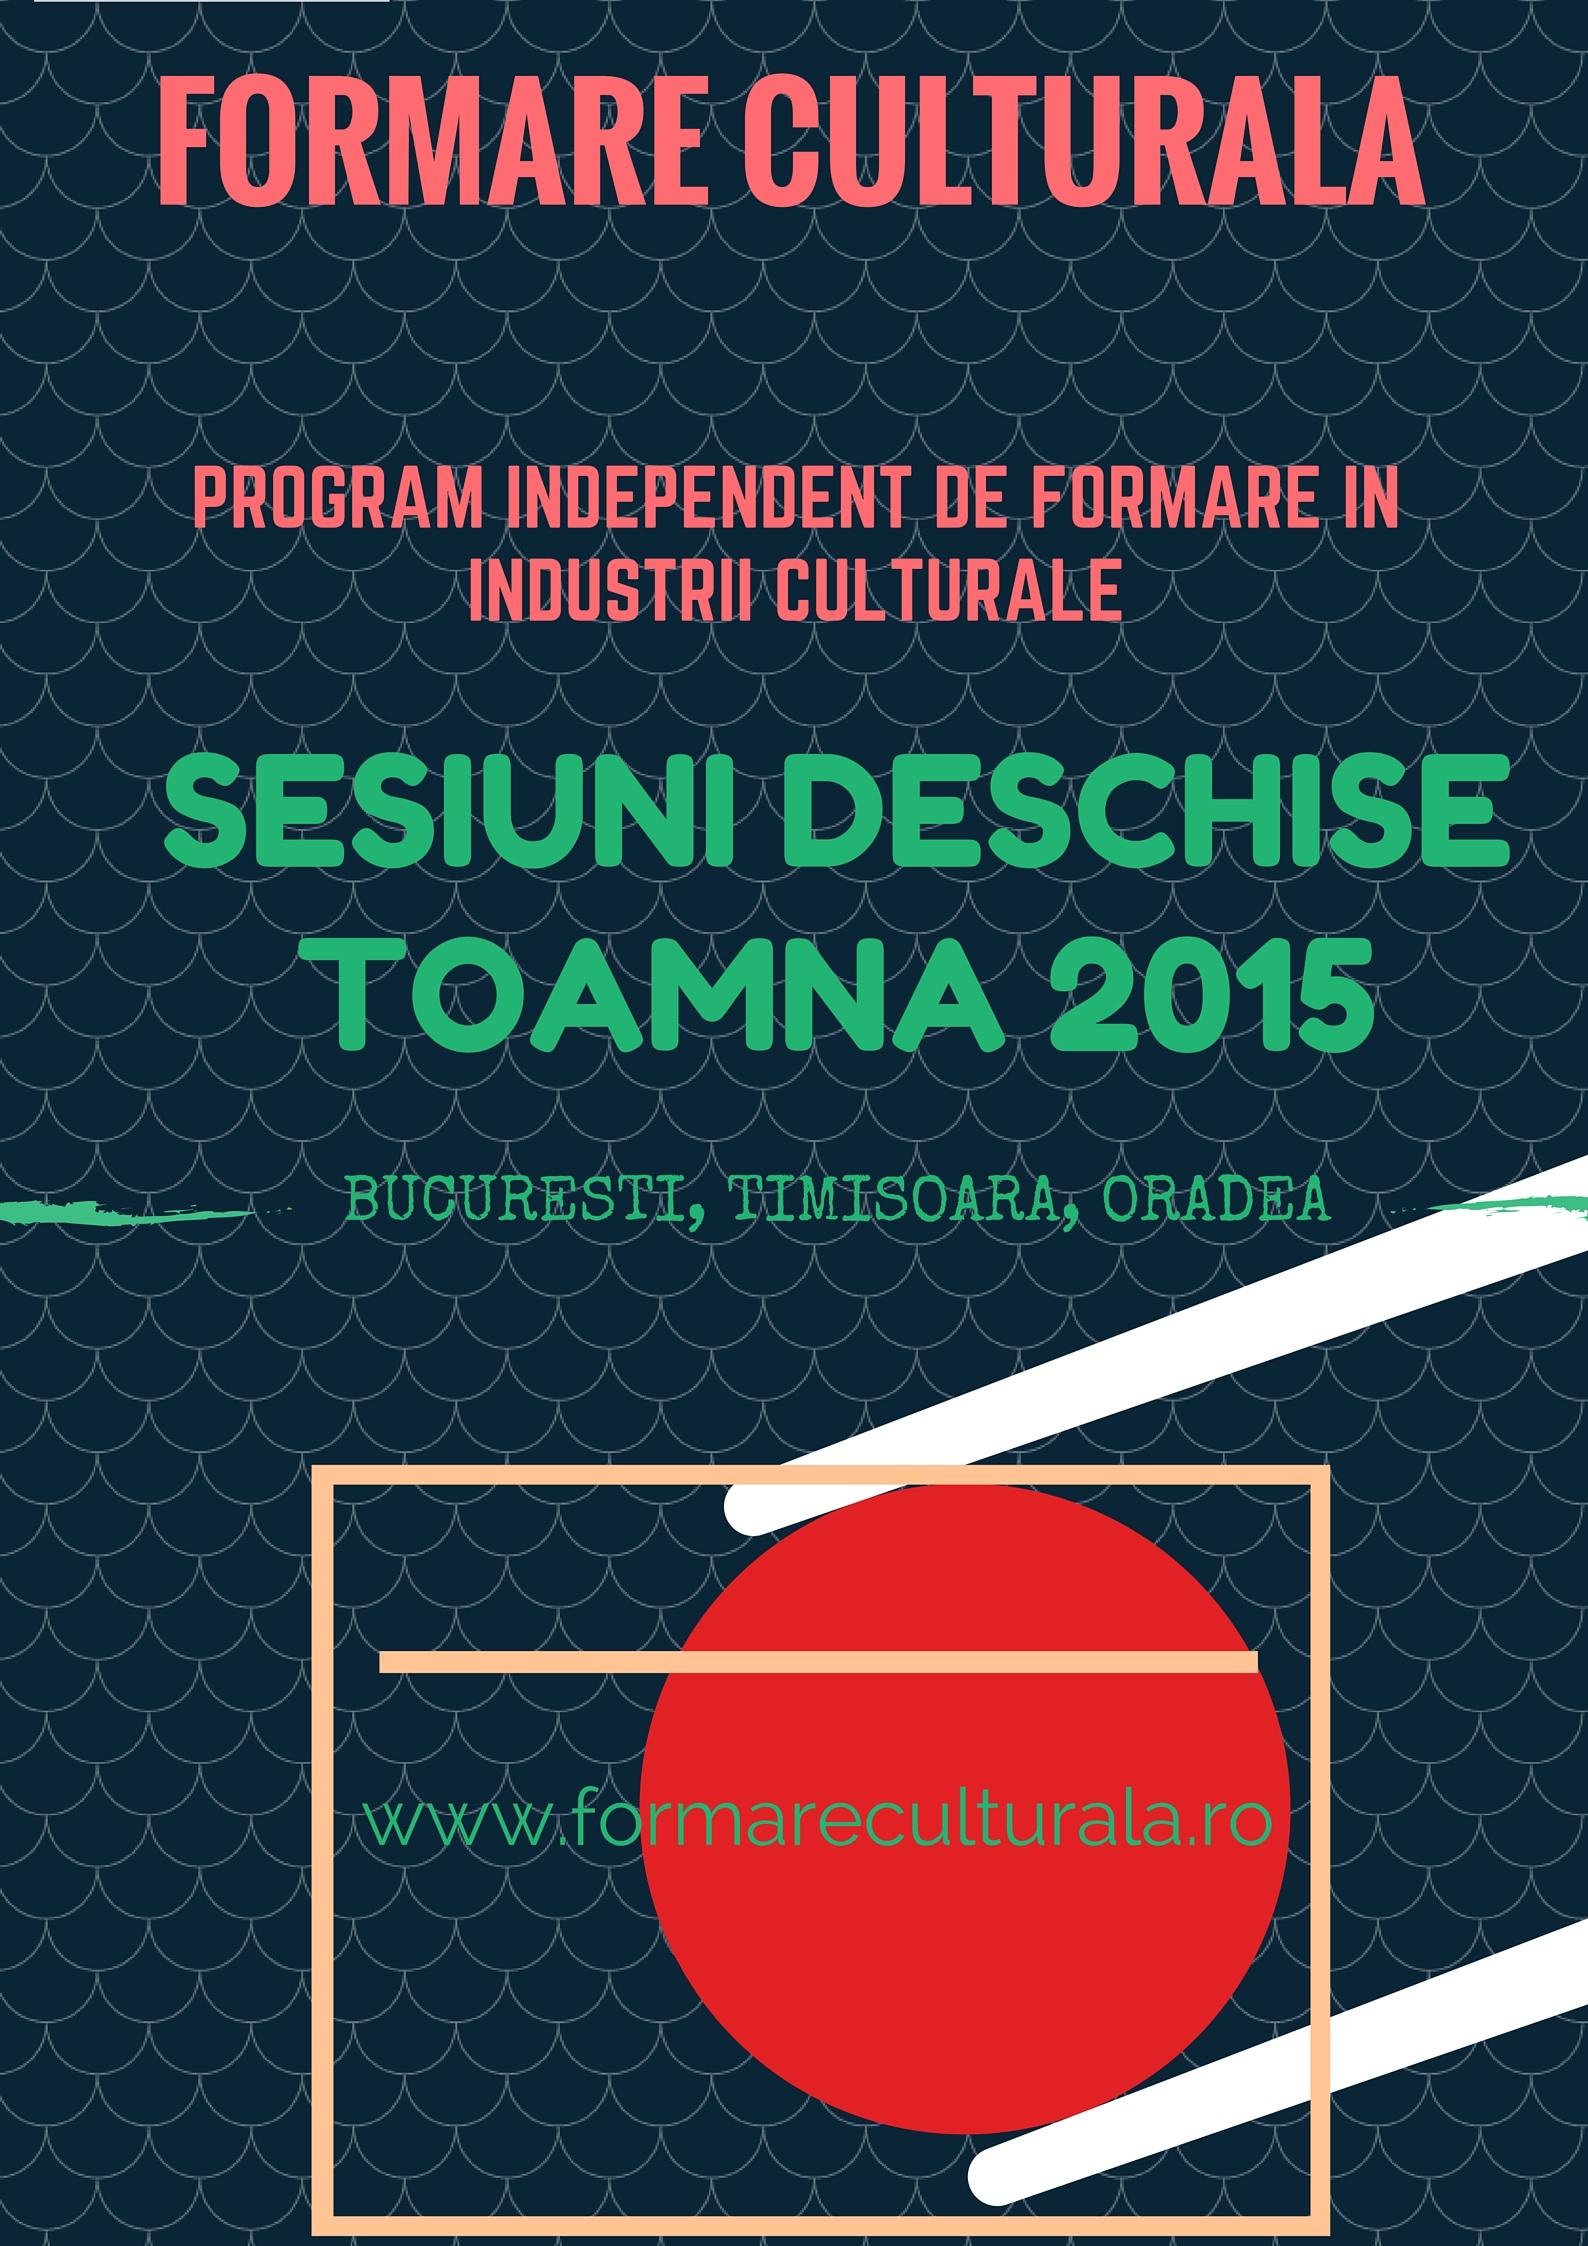 Formare culturala toamna 2015_final